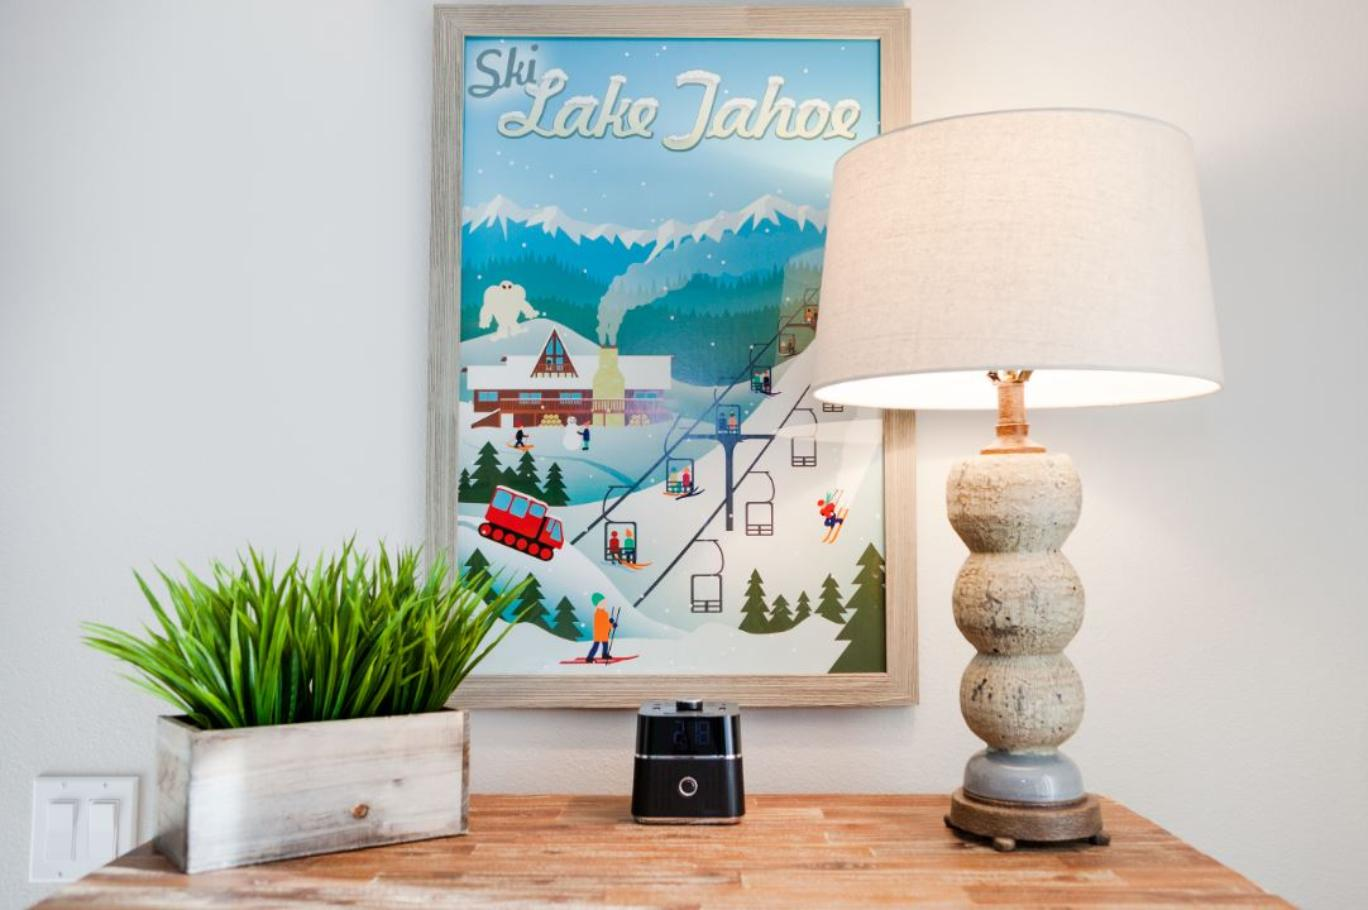 South Lake Tahoe Vacation Rental - Talie Jane Interiors